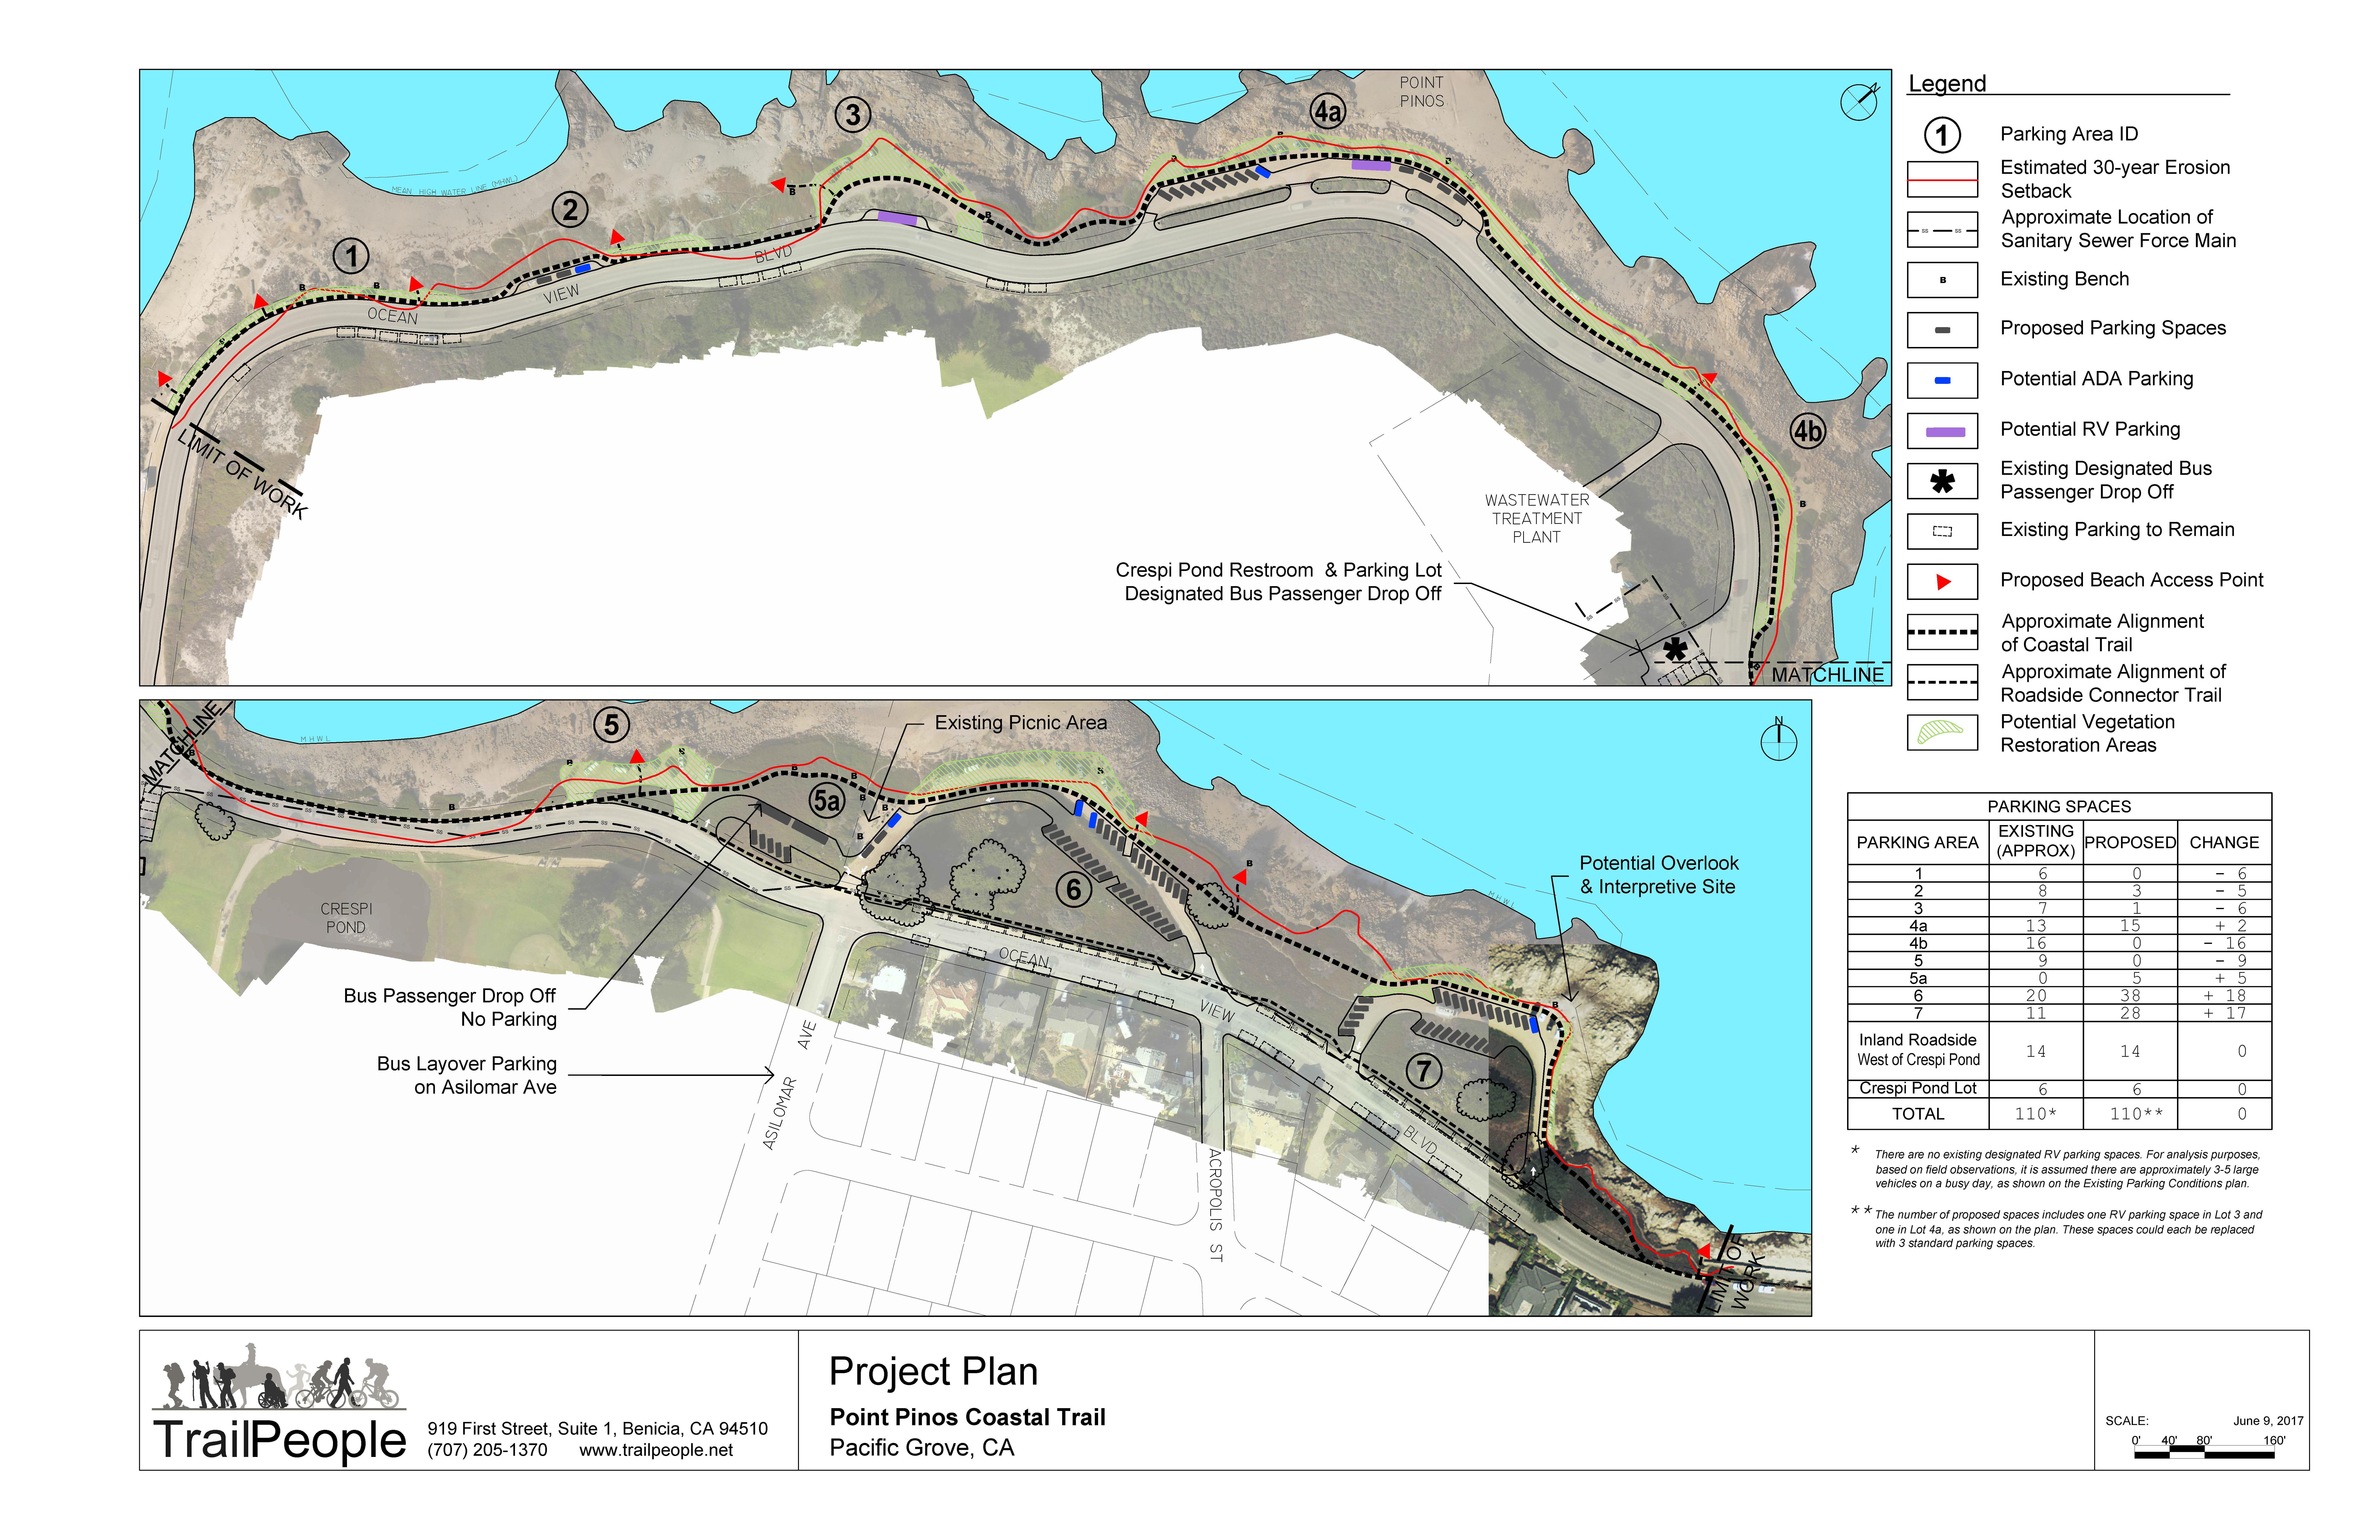 Planning-level project plans